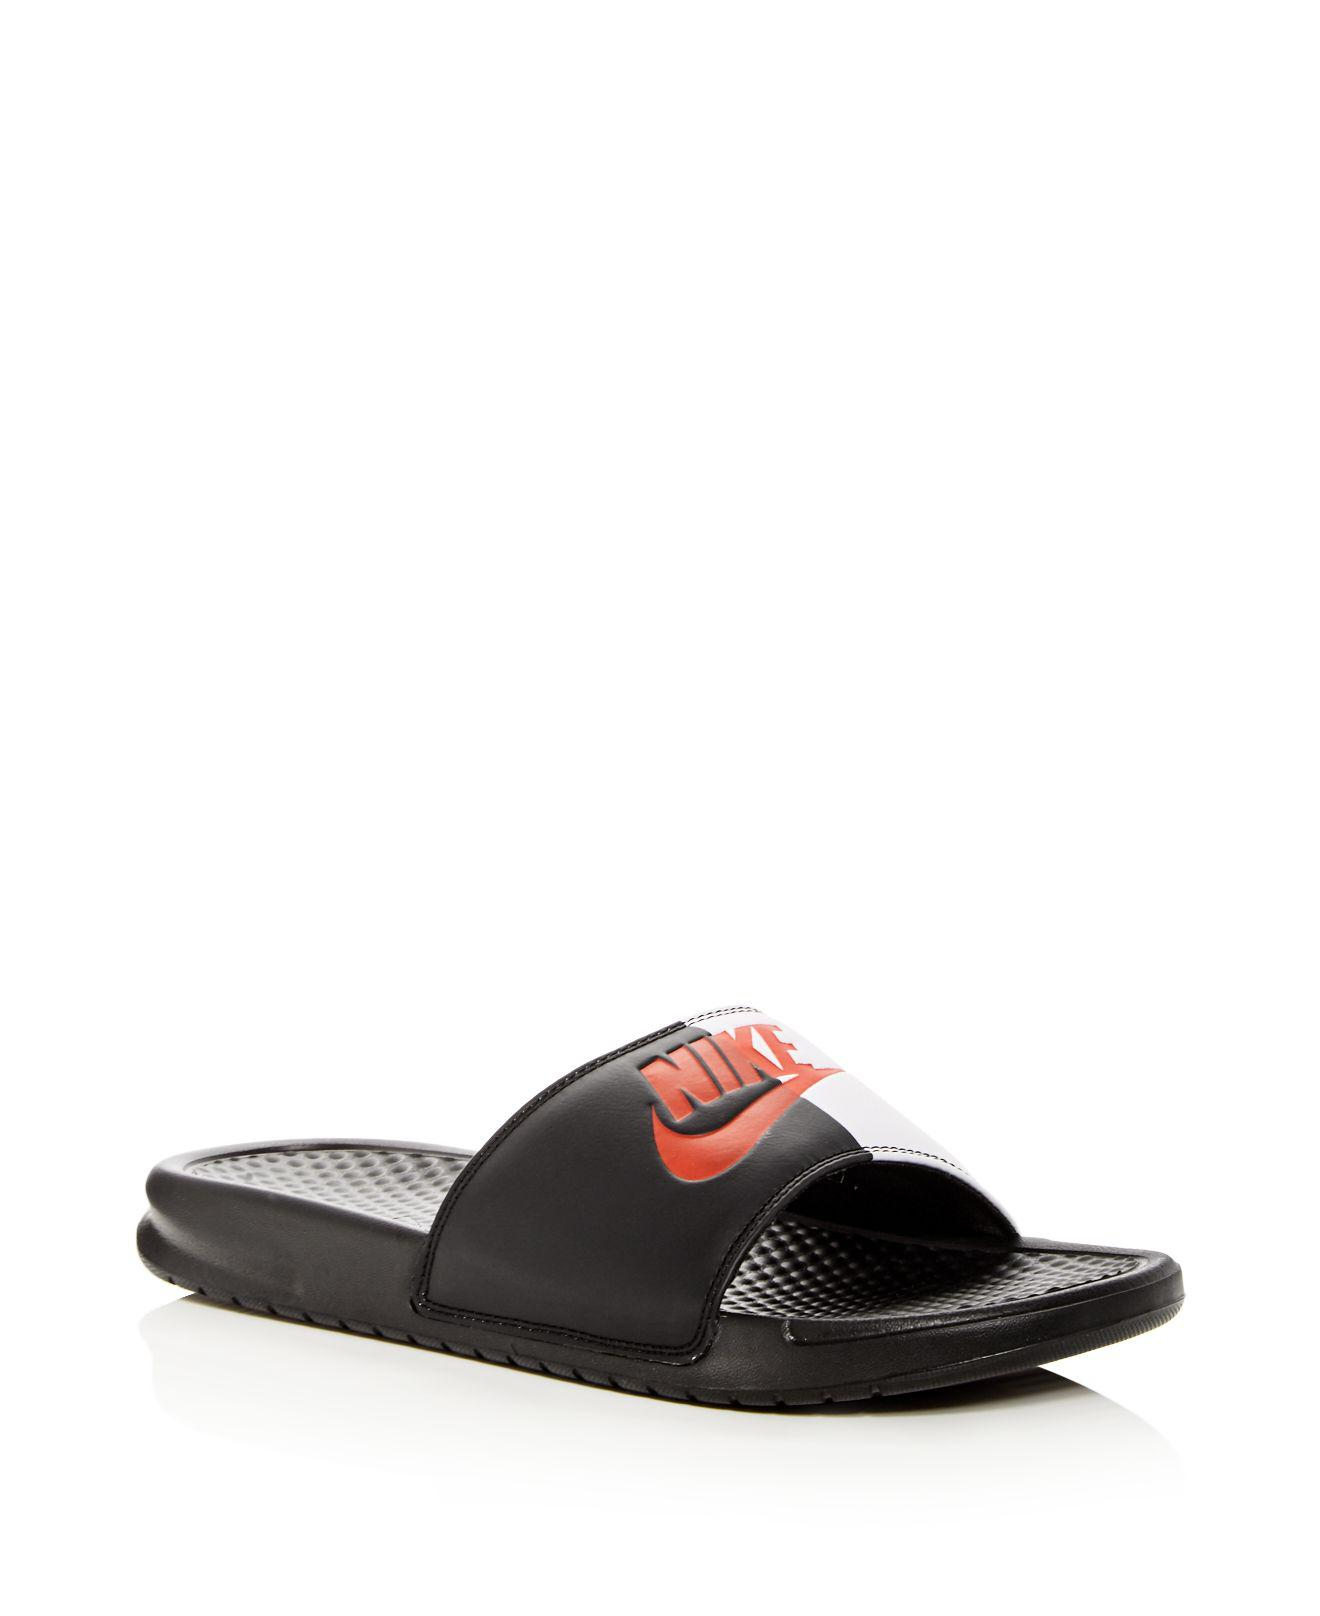 Nike. Black Men's Benassi Slide Sandals